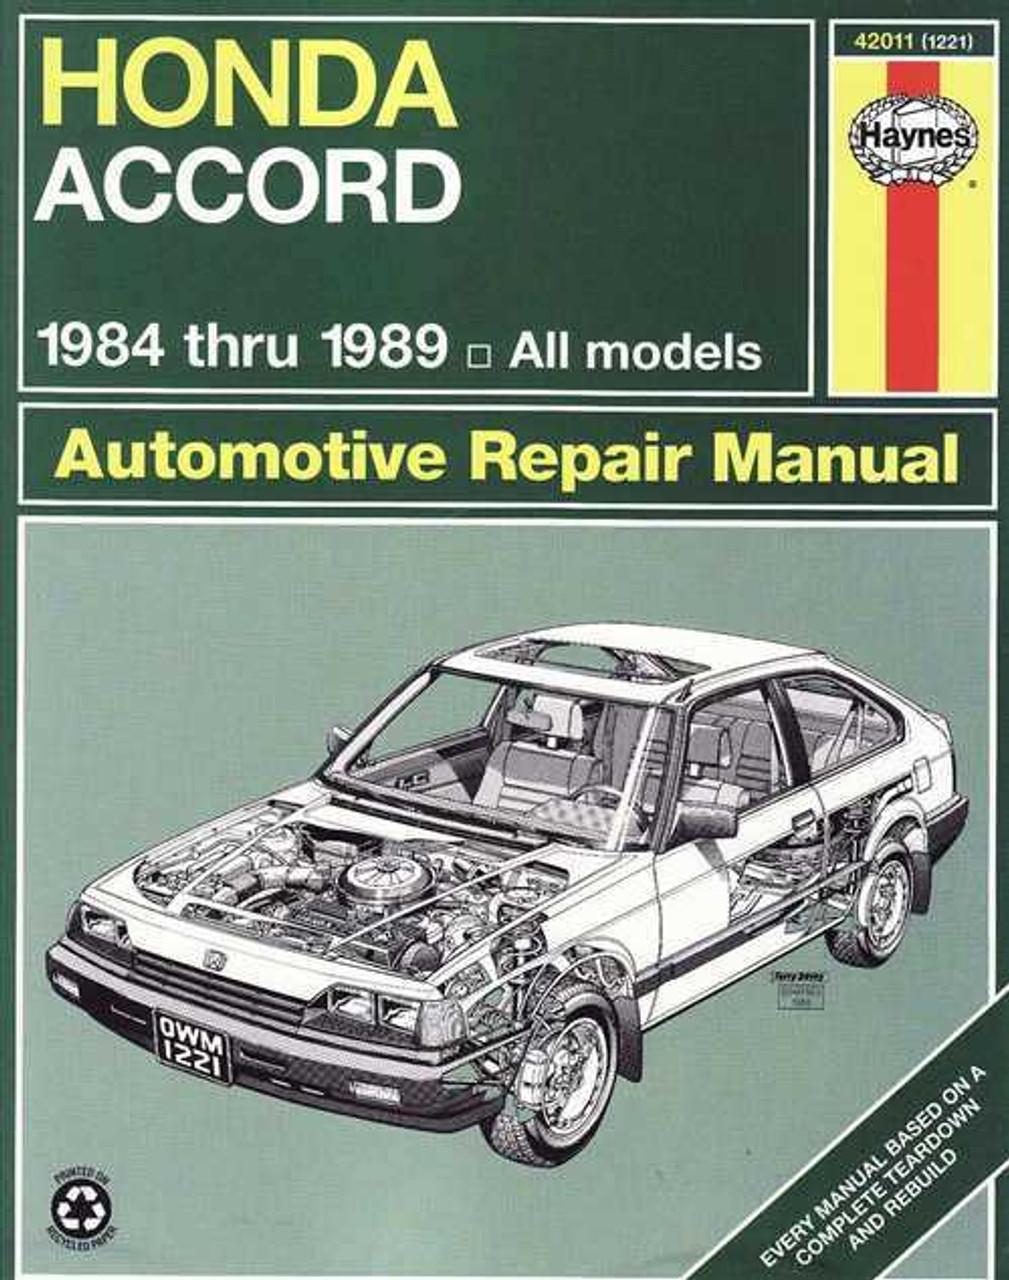 honda accord 1984 1989 workshop manual rh automotobookshop com au 1985 Accord 1989 honda accord service manual pdf